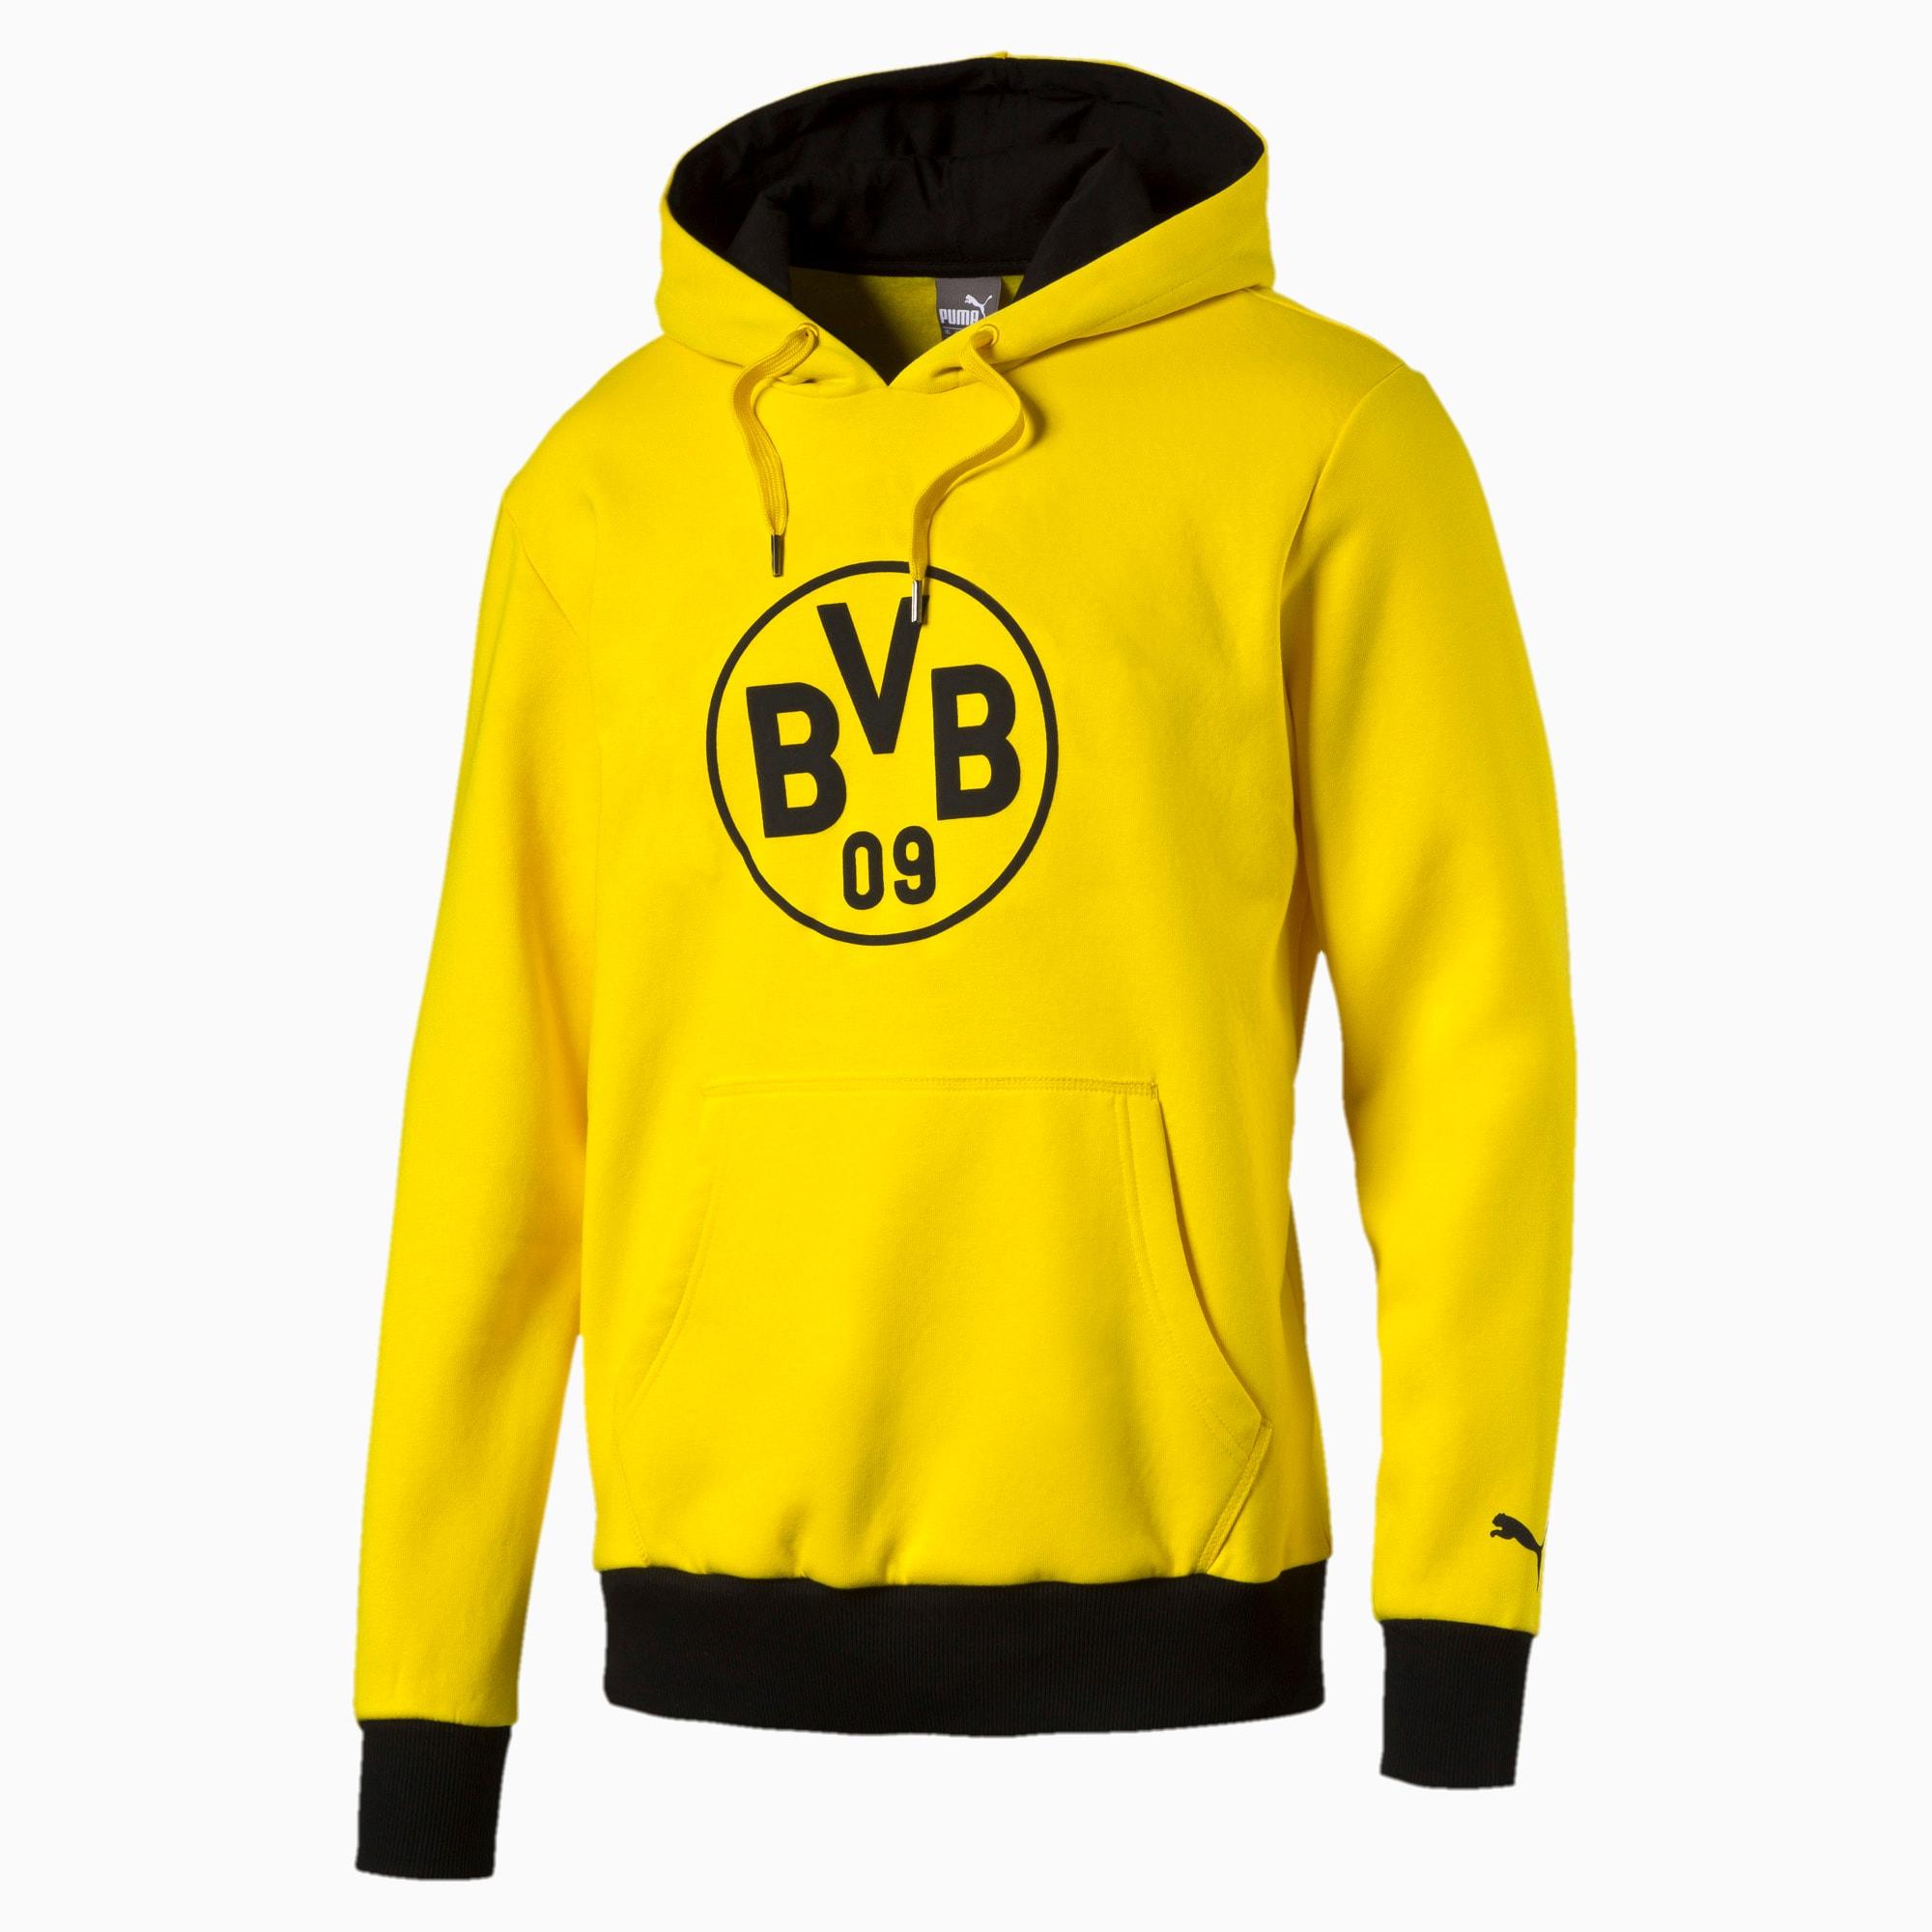 BVB 09 Borussia Dortmund KIDS Hoody